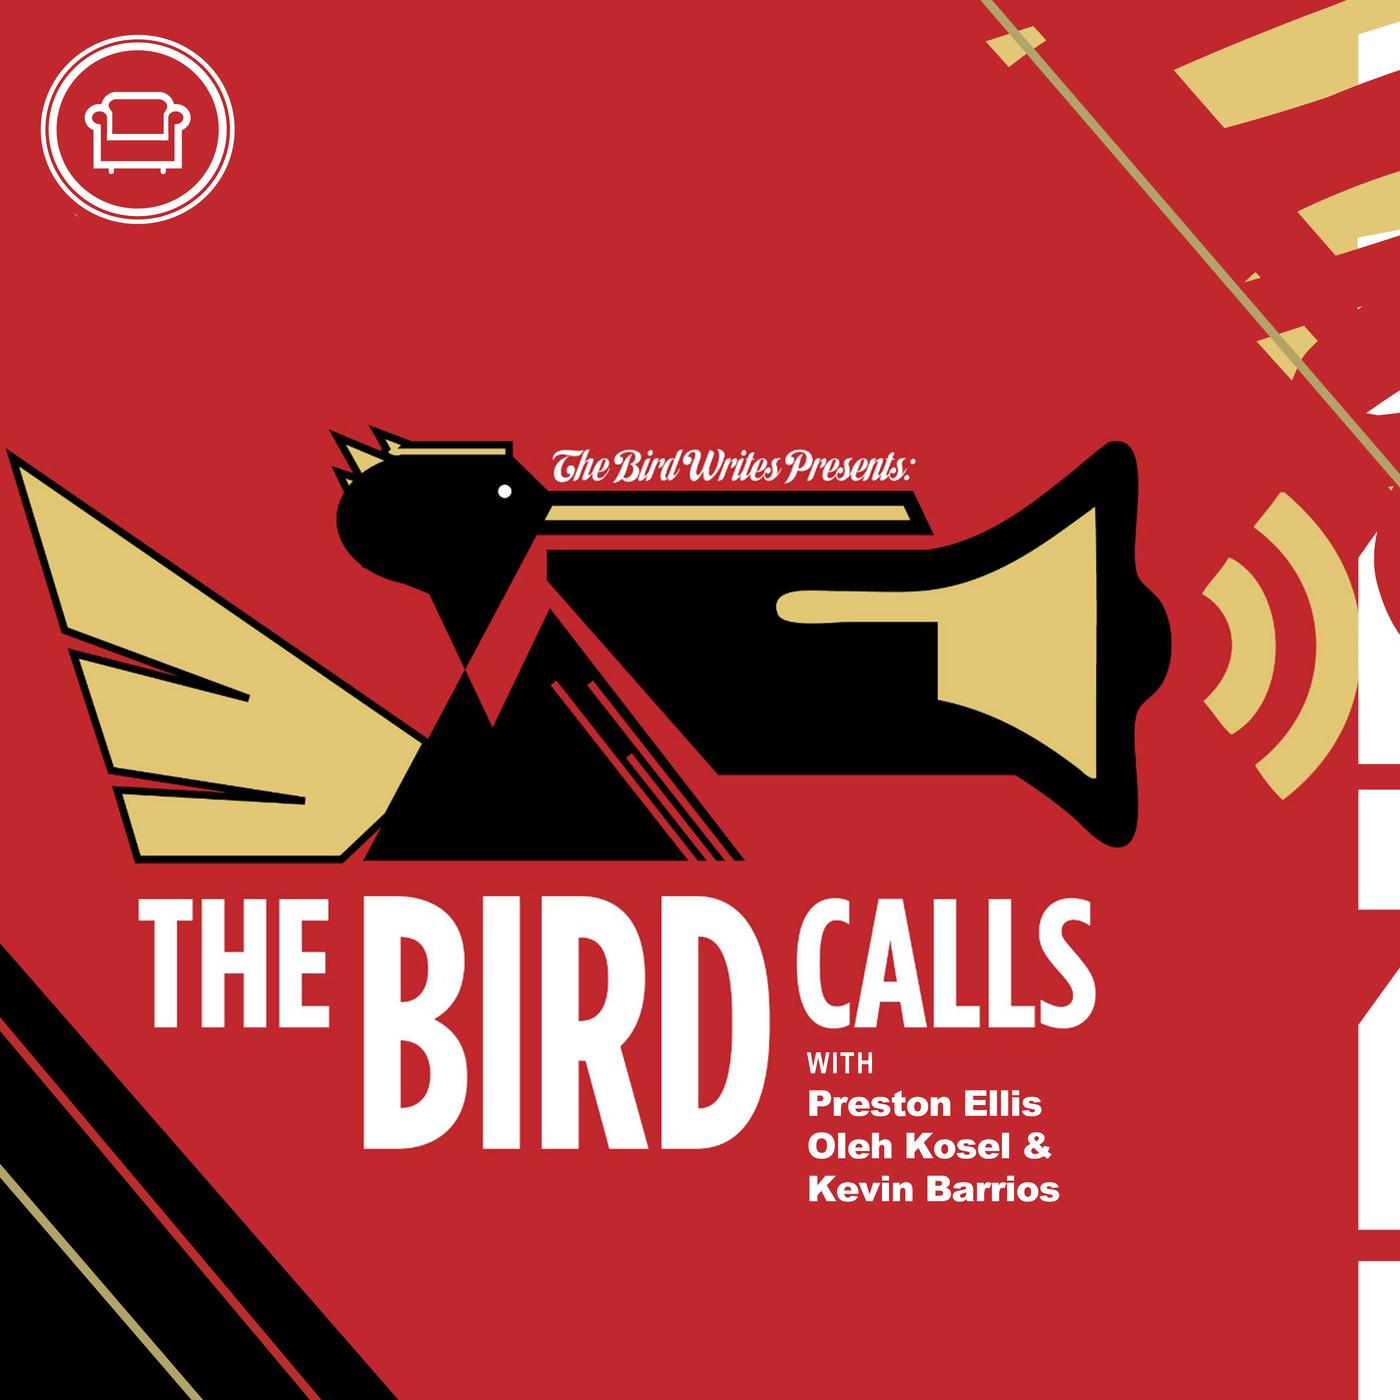 The Bird Calls